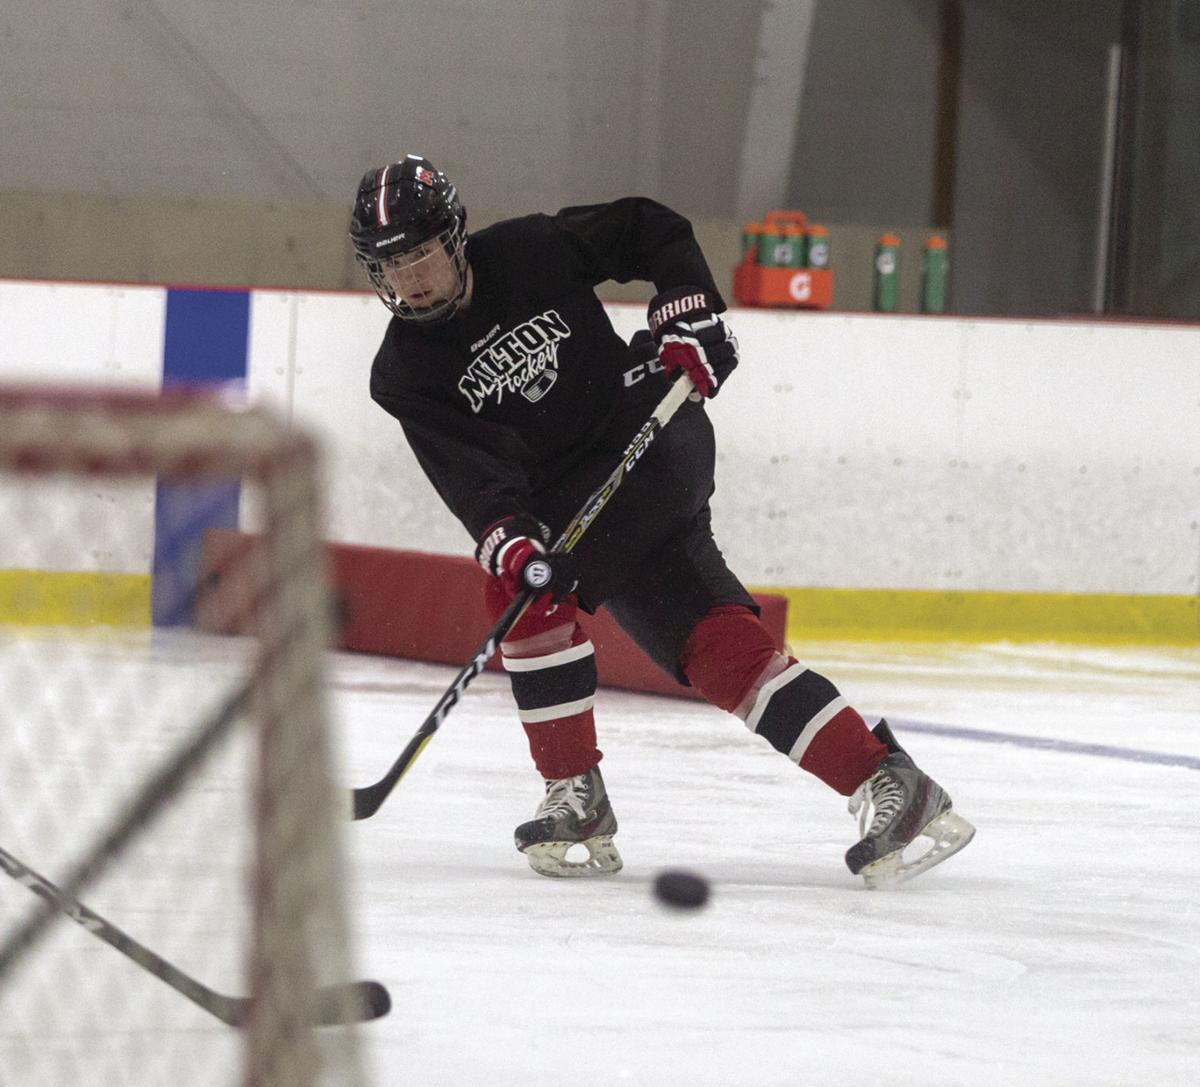 Zartman to lead Red Hawk hockey